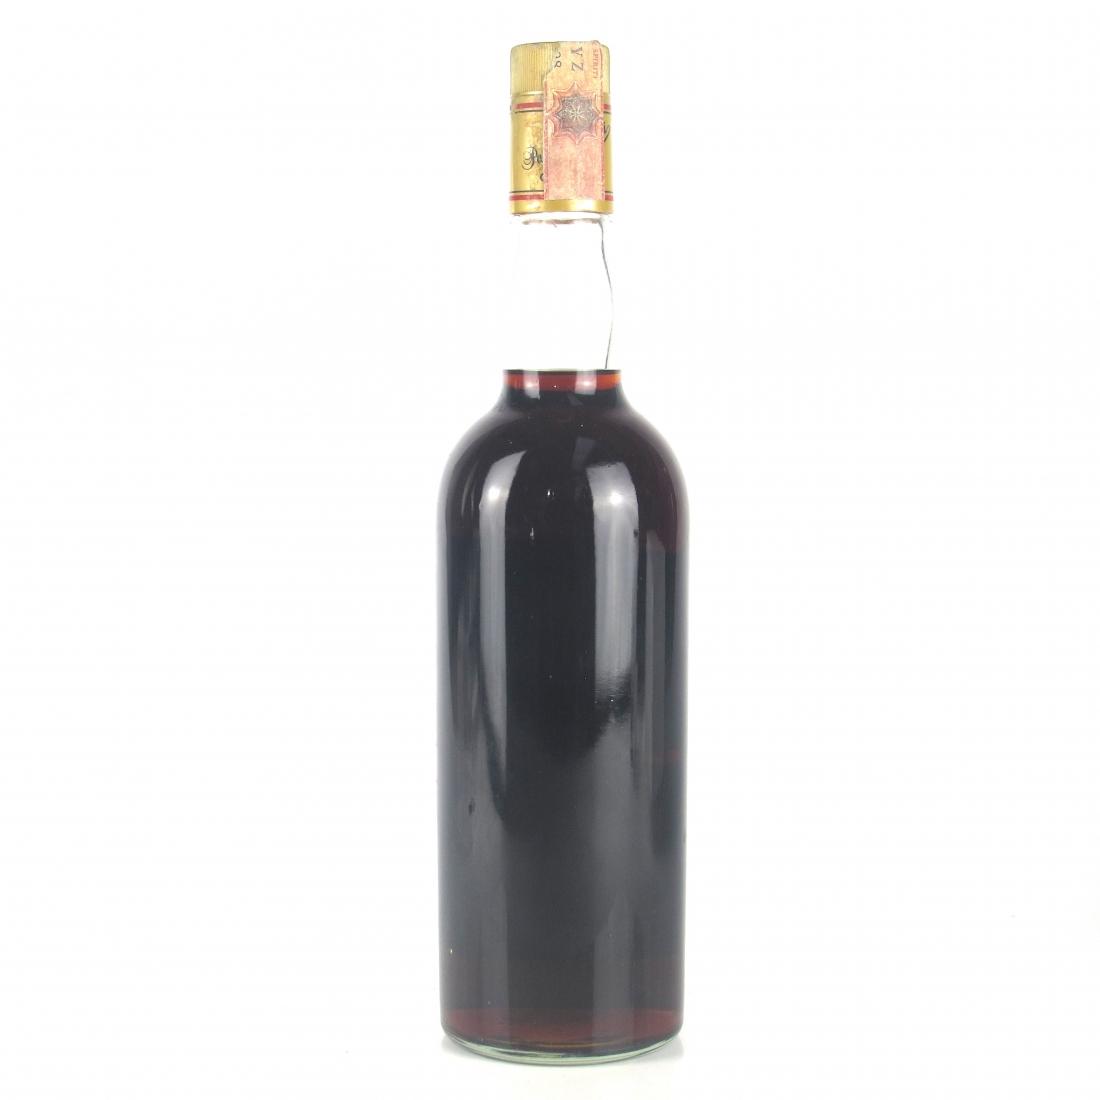 Paolucci Coffee Sambuca 1 Litre 1980s